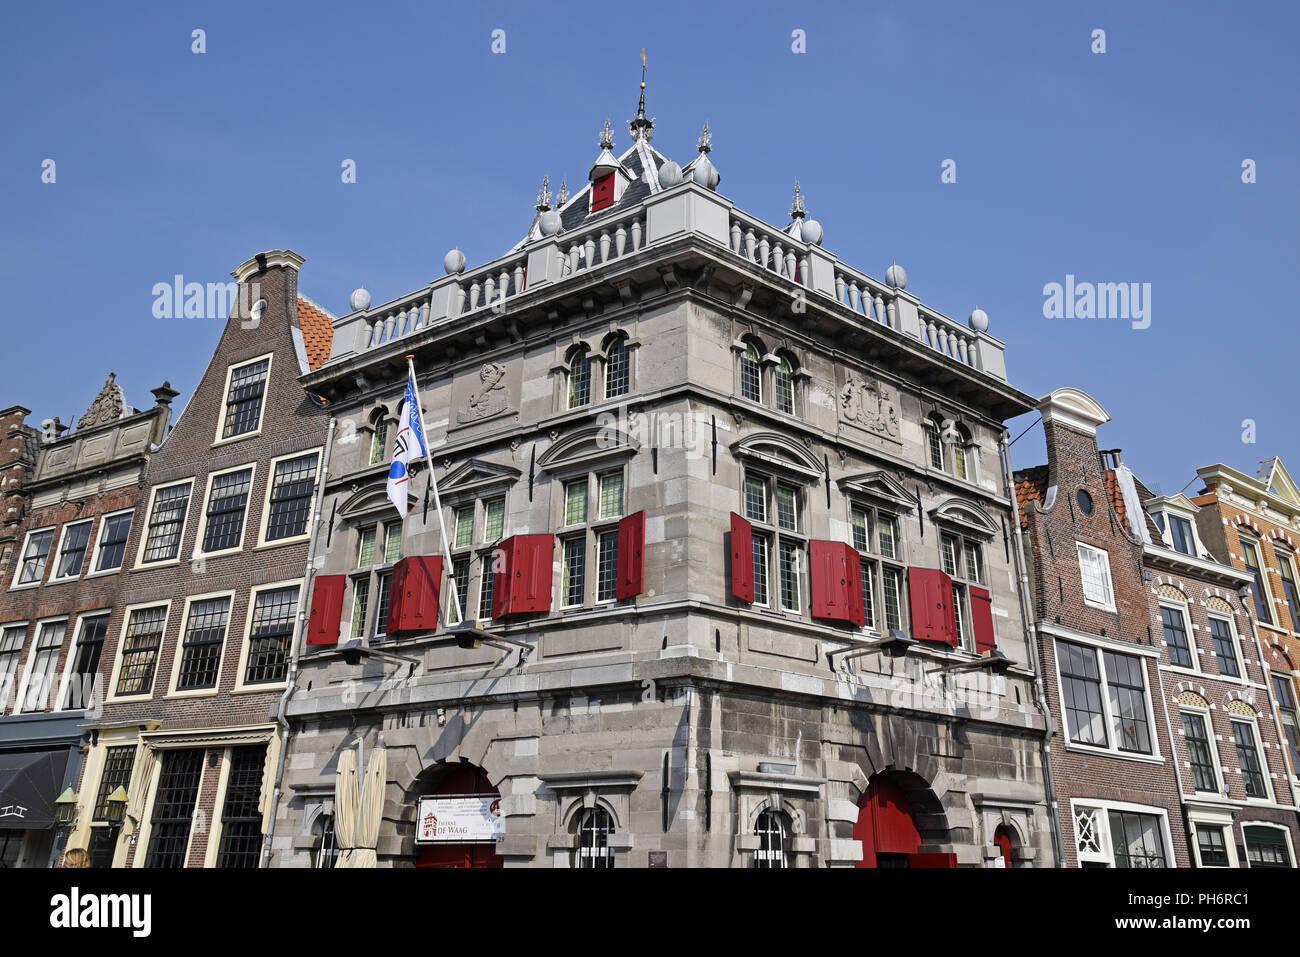 De Waag, Weighing House, Haarlem, The Netherlands - Stock Image